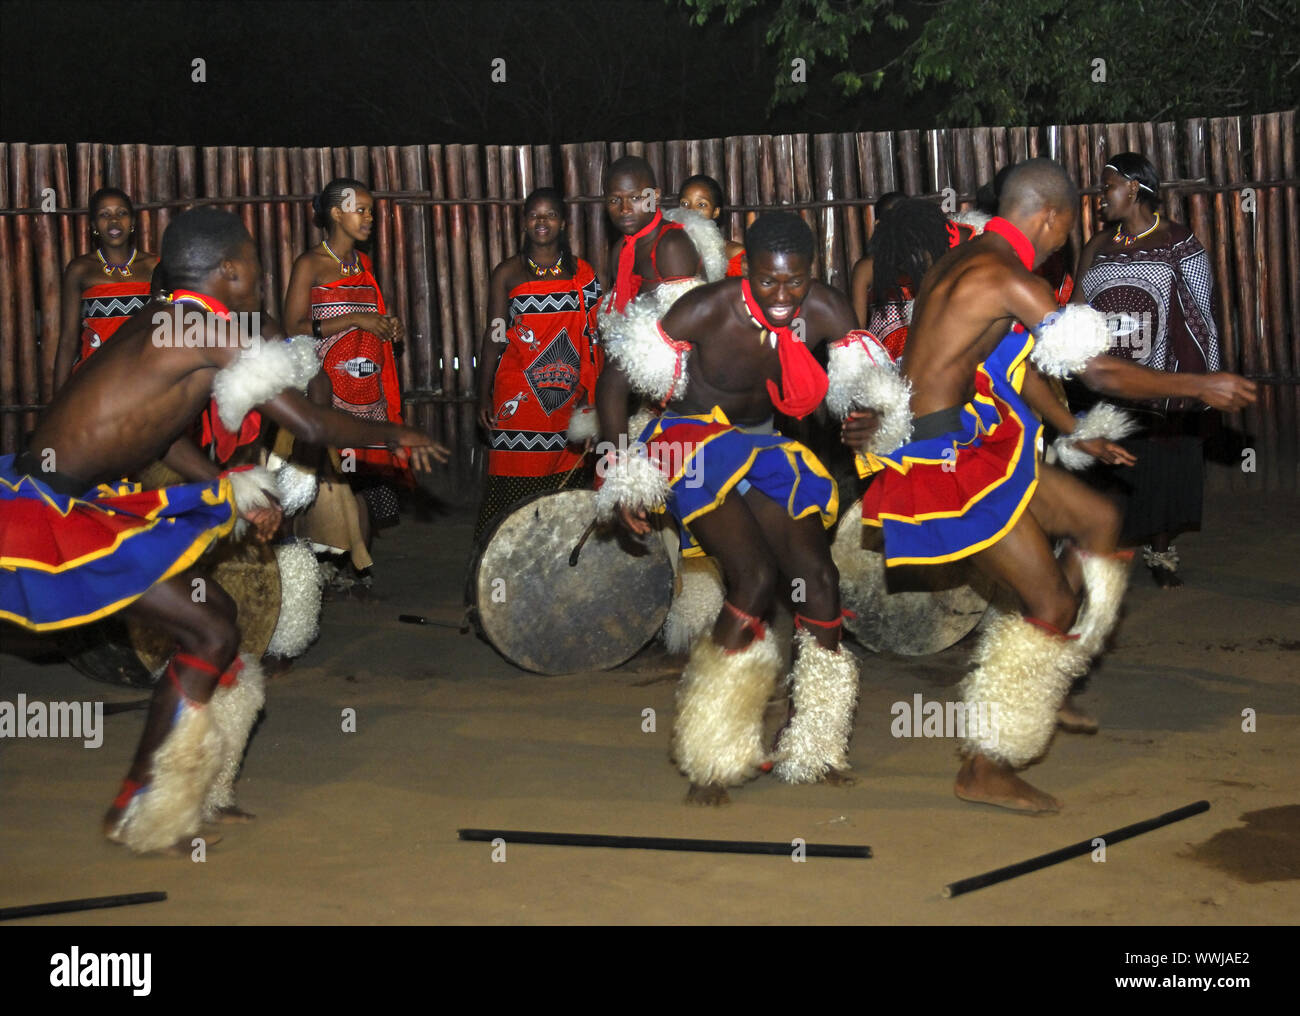 Male Dance Group, Swaziland Stock Photo